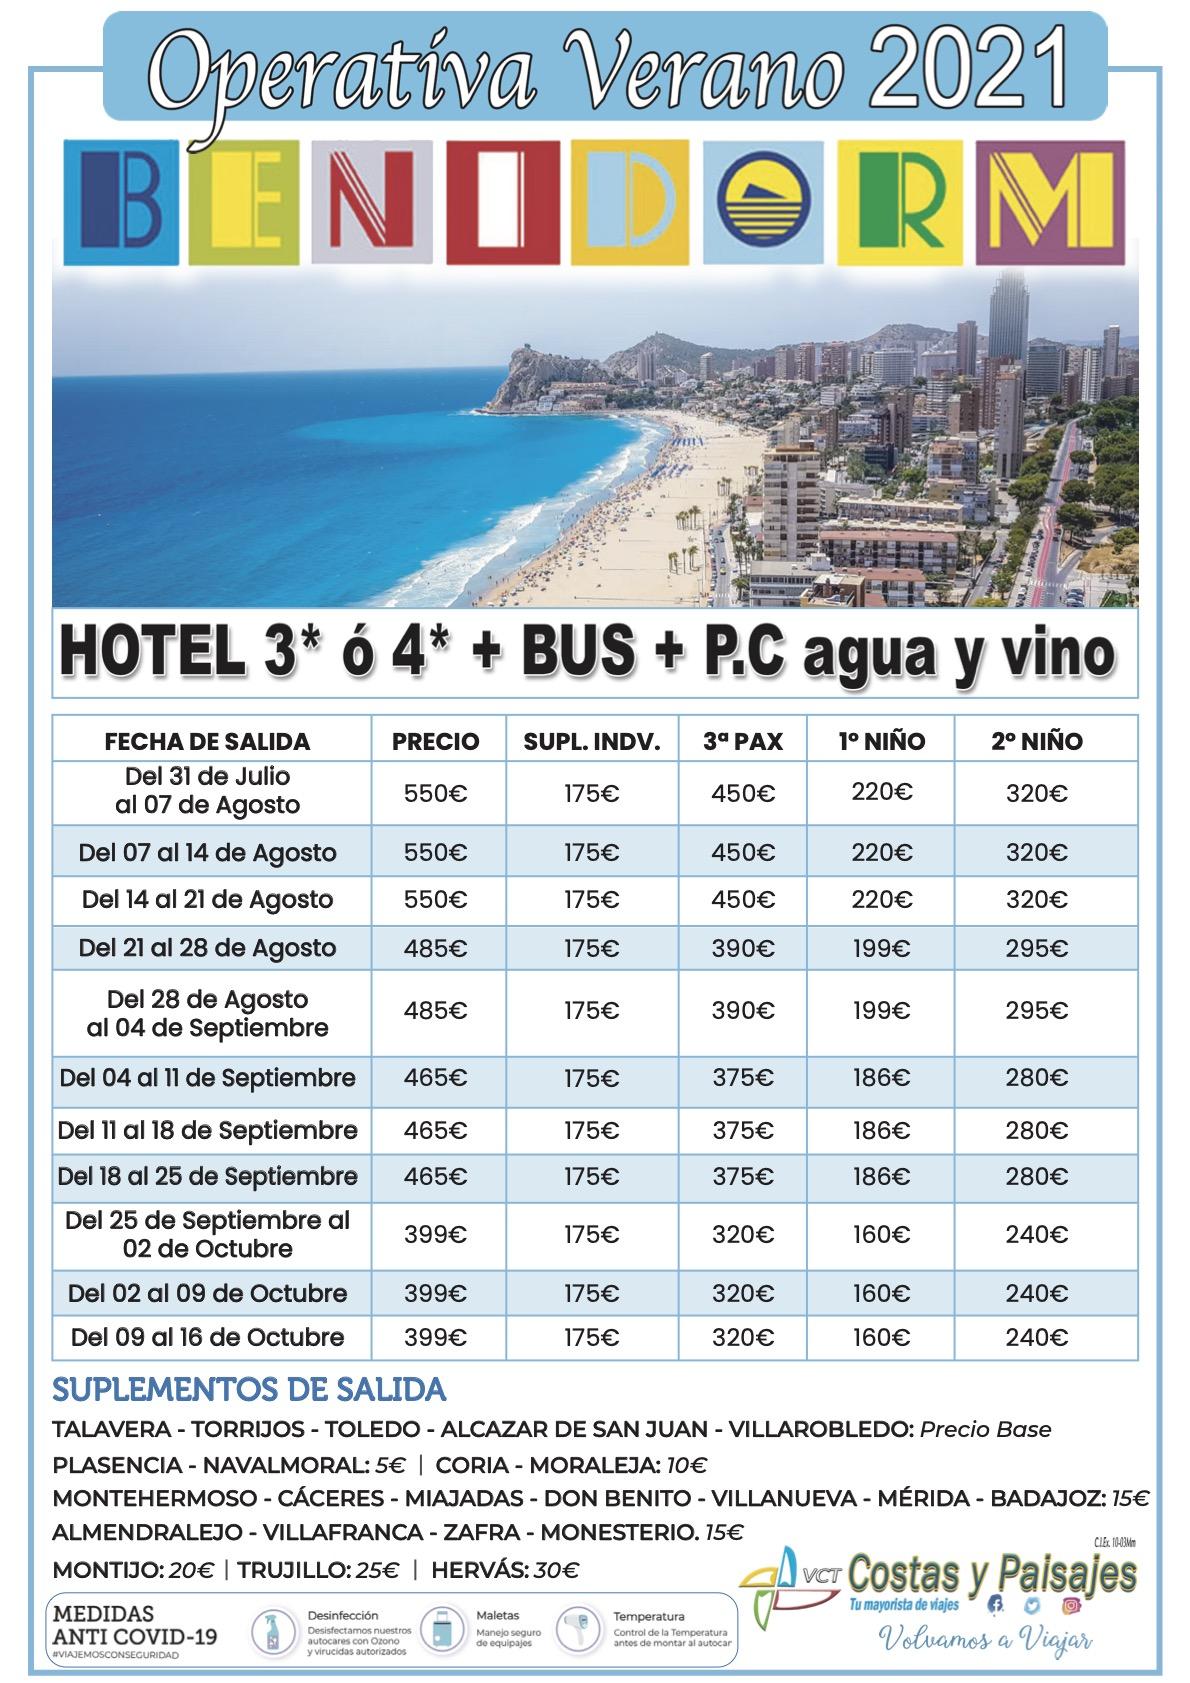 Benidorm Bus+Hotel Operativa 2021